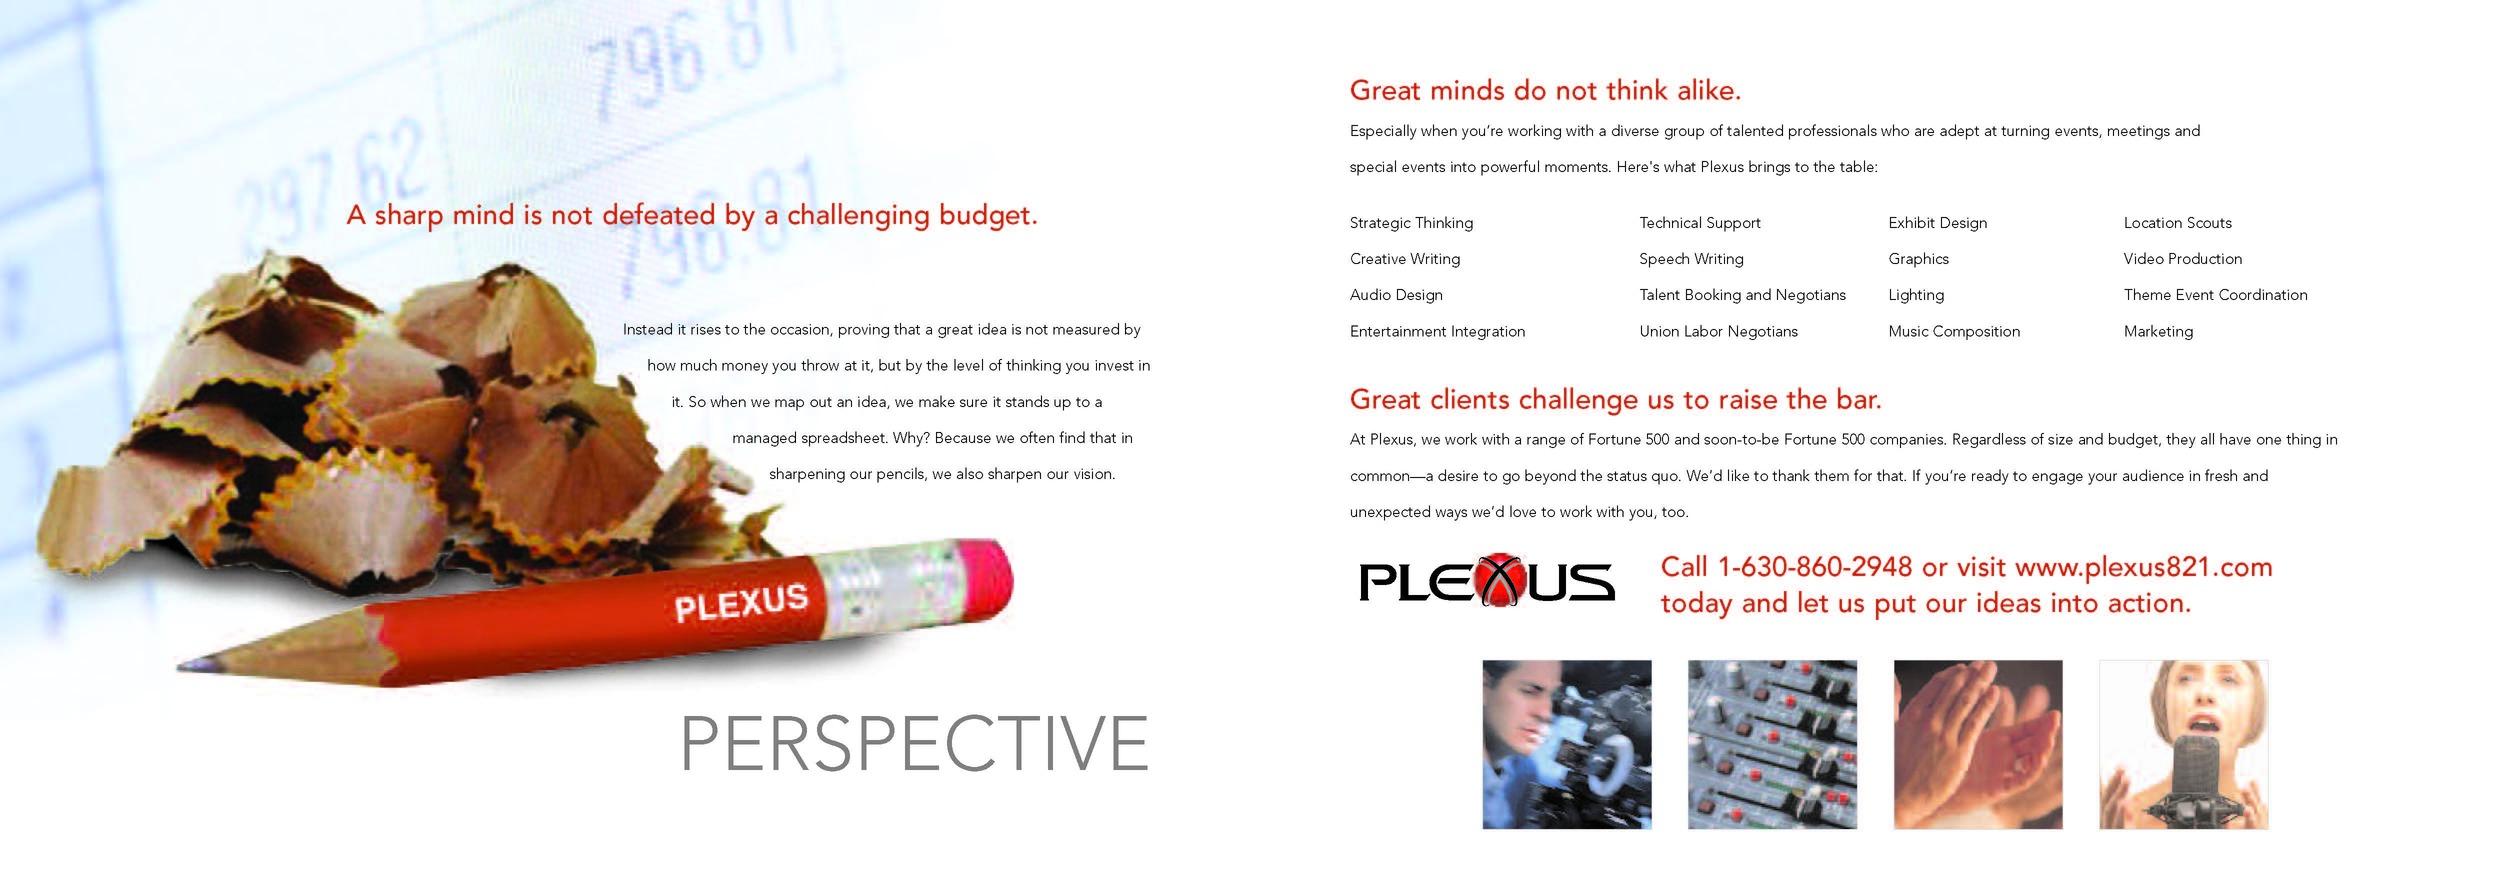 PLEX_8PG-brochure2_7-21_Page_4.jpg